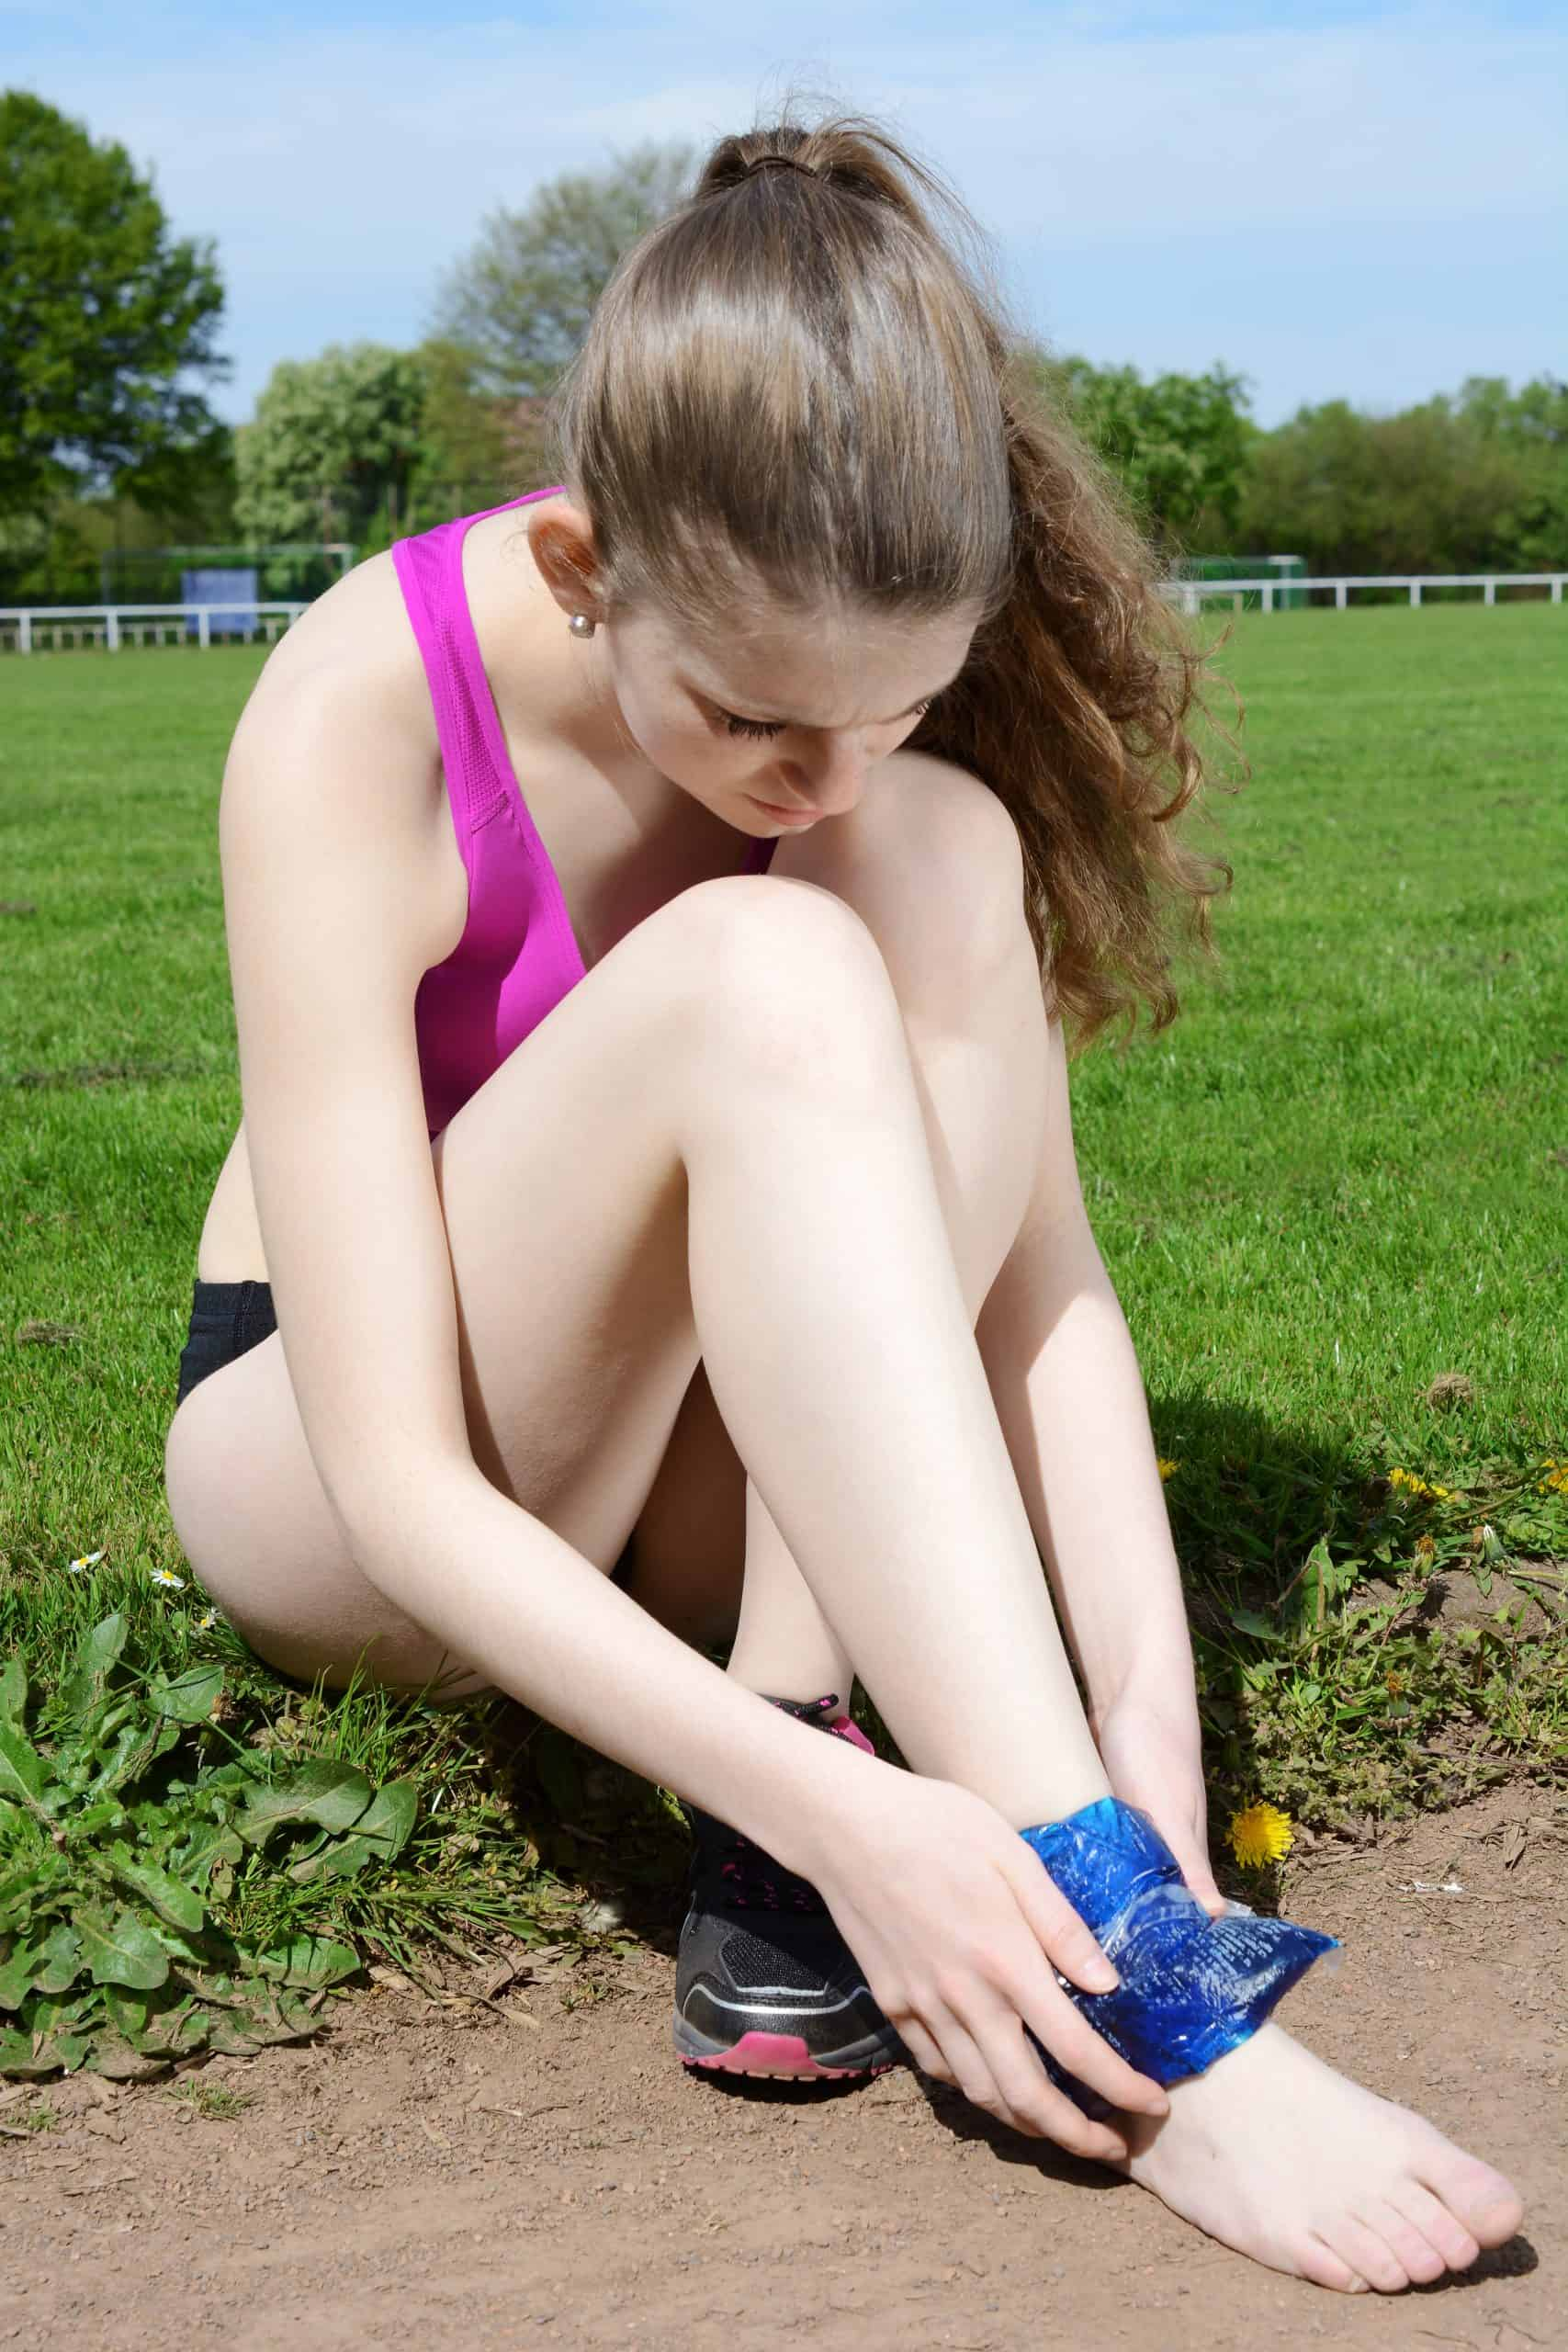 Run-Walk-PLAY-Tibialis-posterior-pain